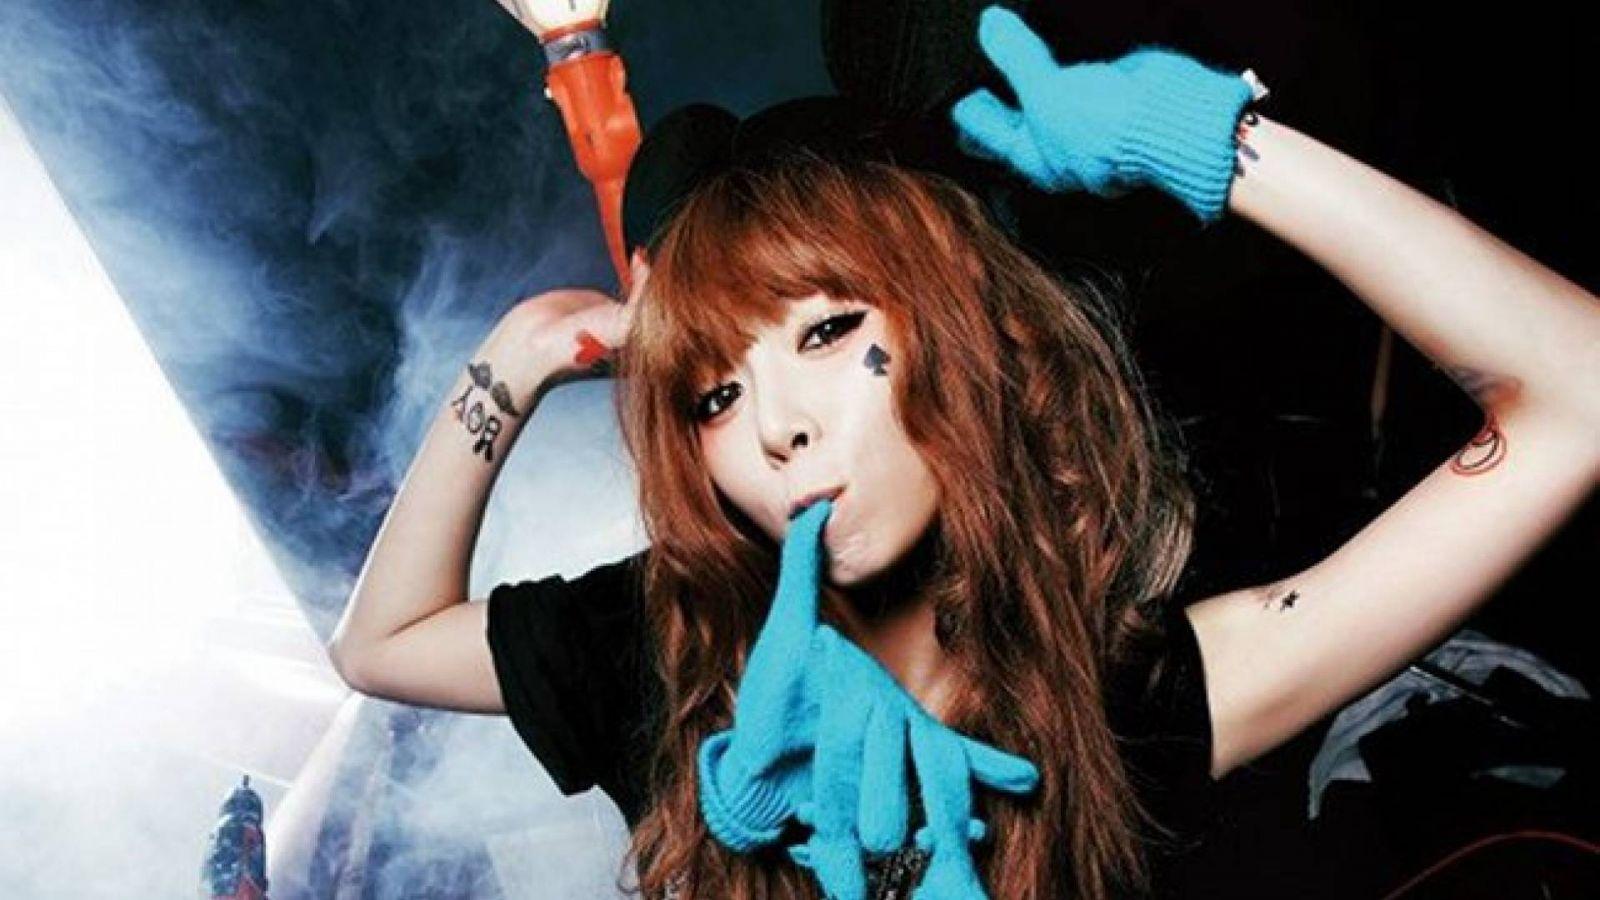 HyunA julkaisee uutta materiaalia © Cube United